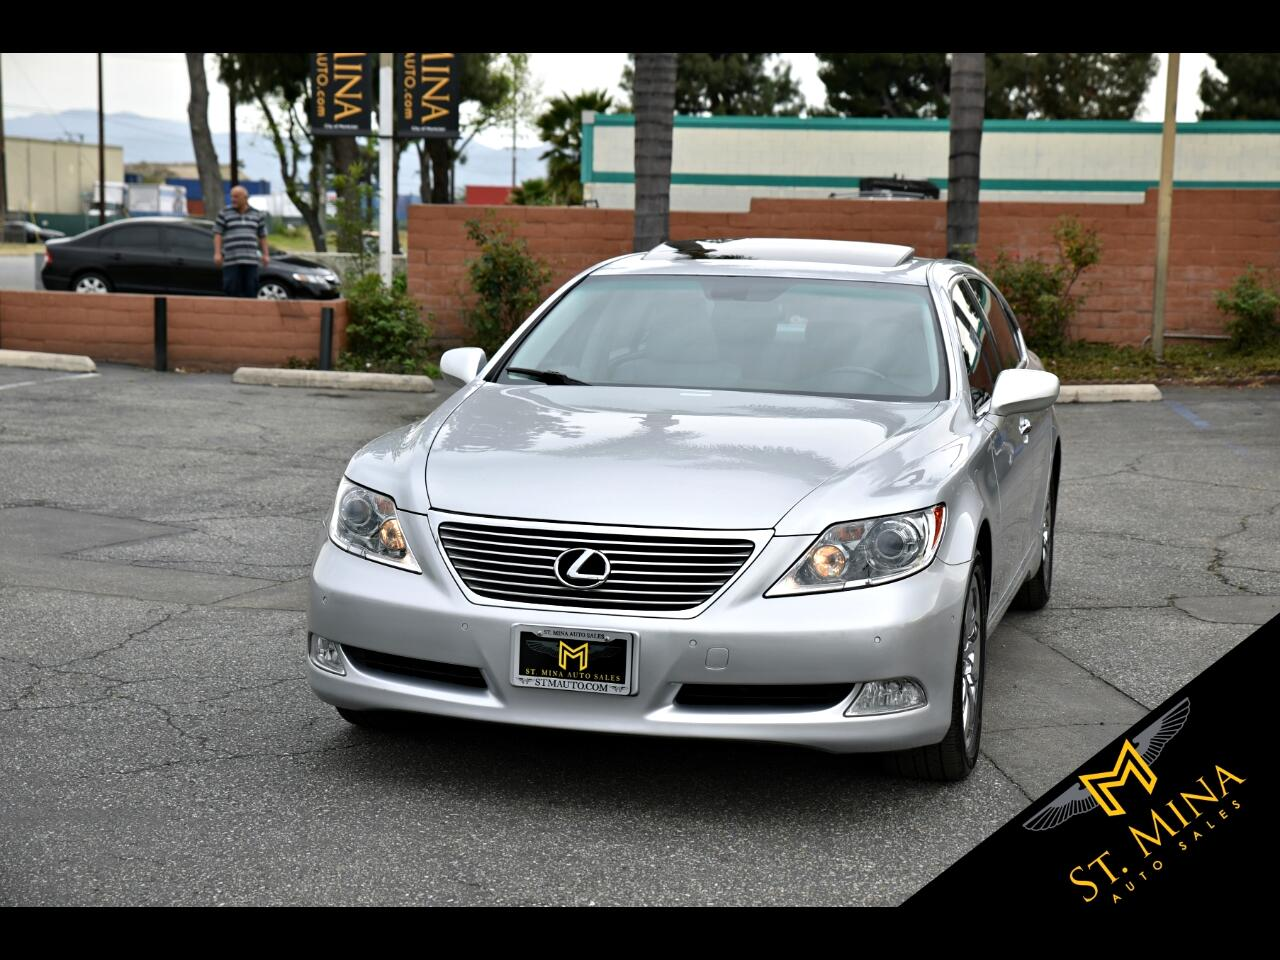 2009 Lexus LS 460 L Luxury Sedan